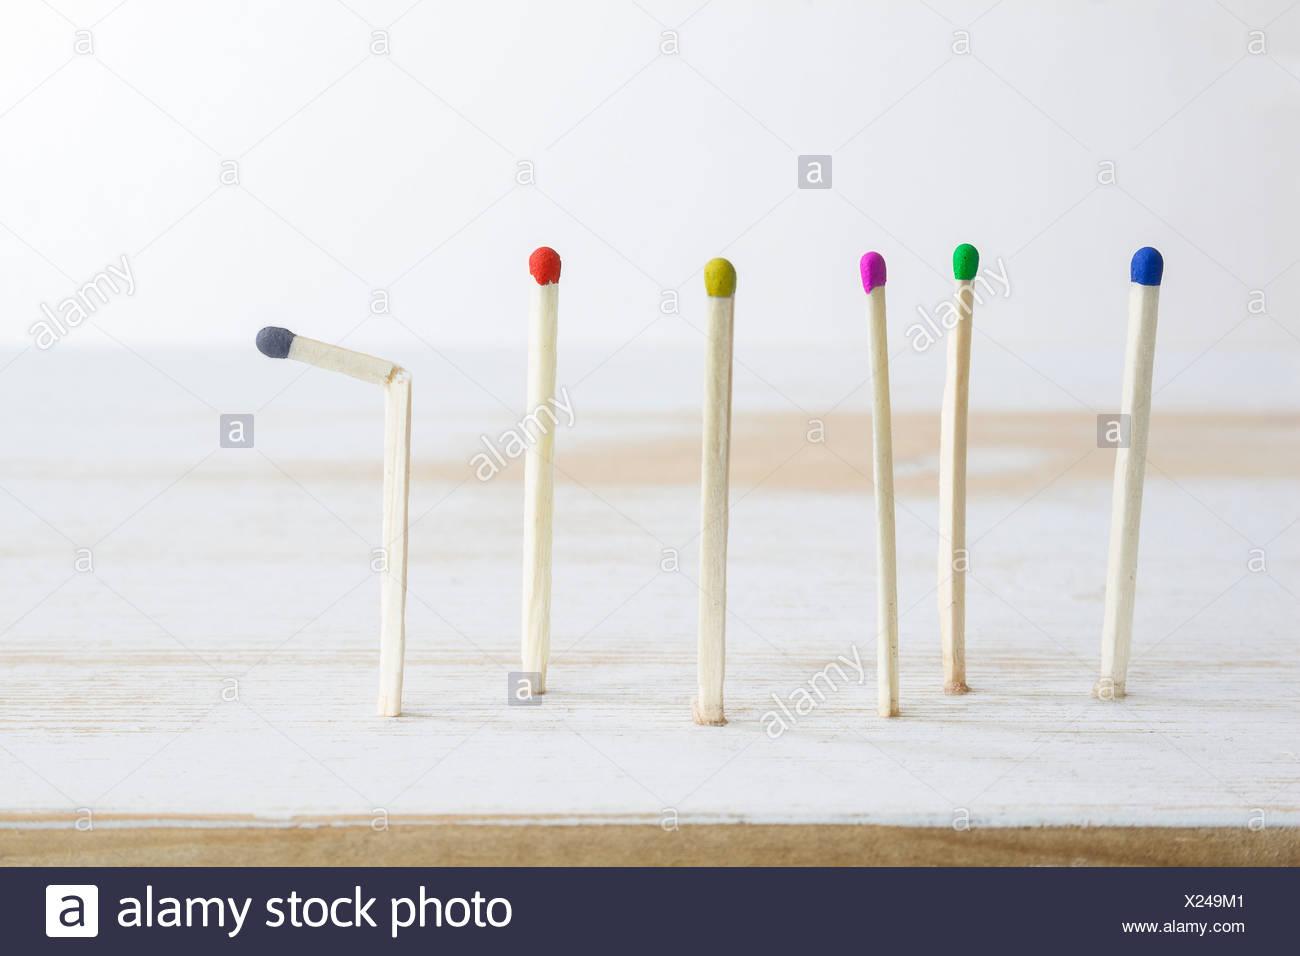 Matches, Concept, Depression - Stock Image